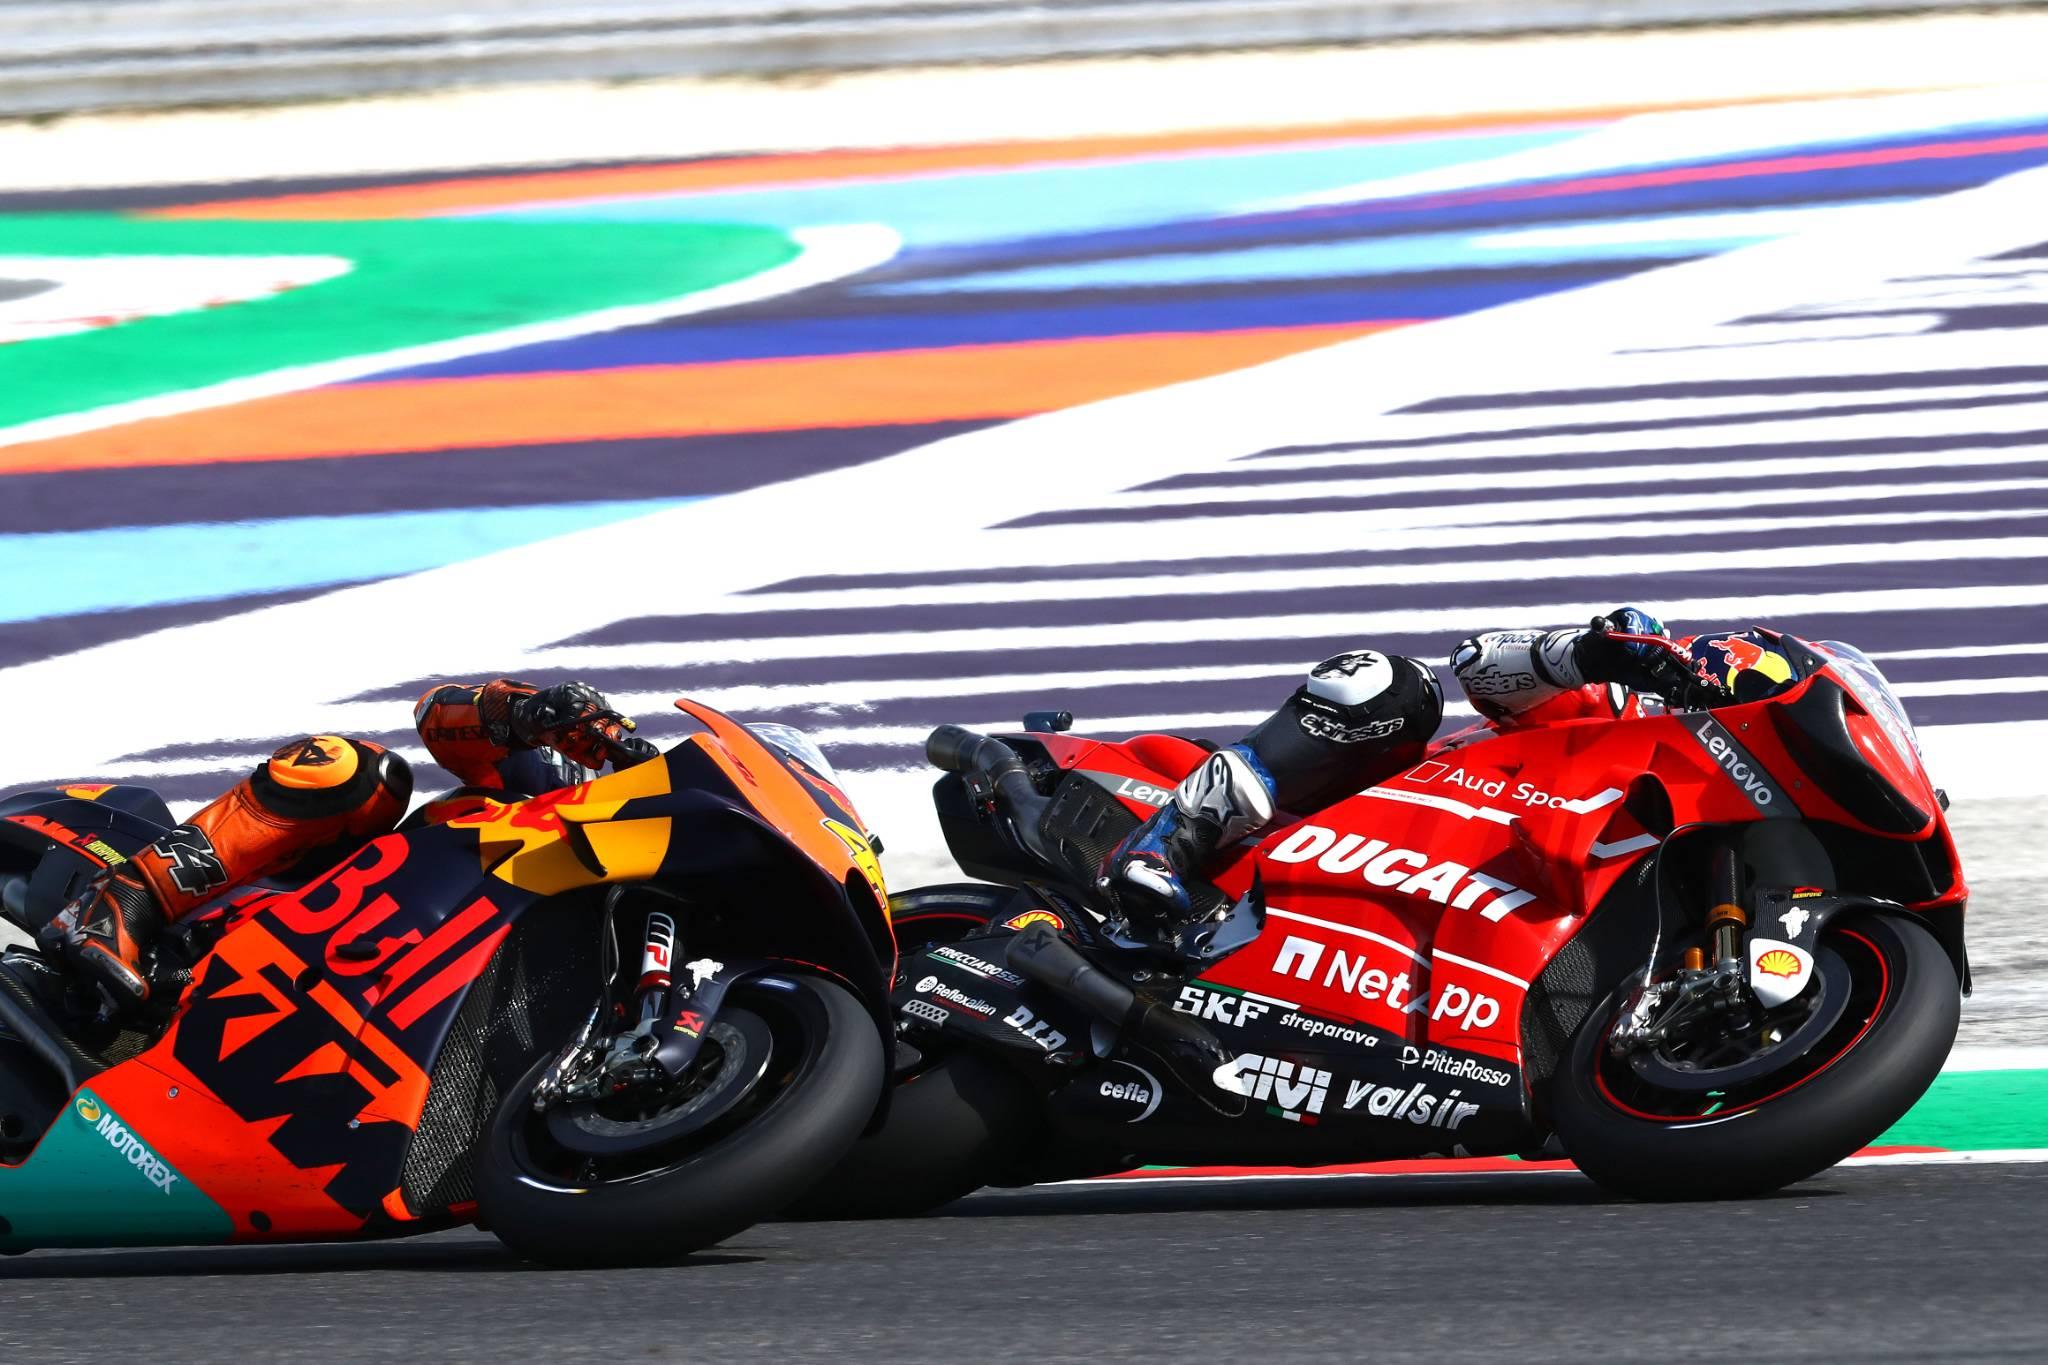 Dovizioso, Pol Espargaro, MotoGP race, San Marino MotoGP 2019